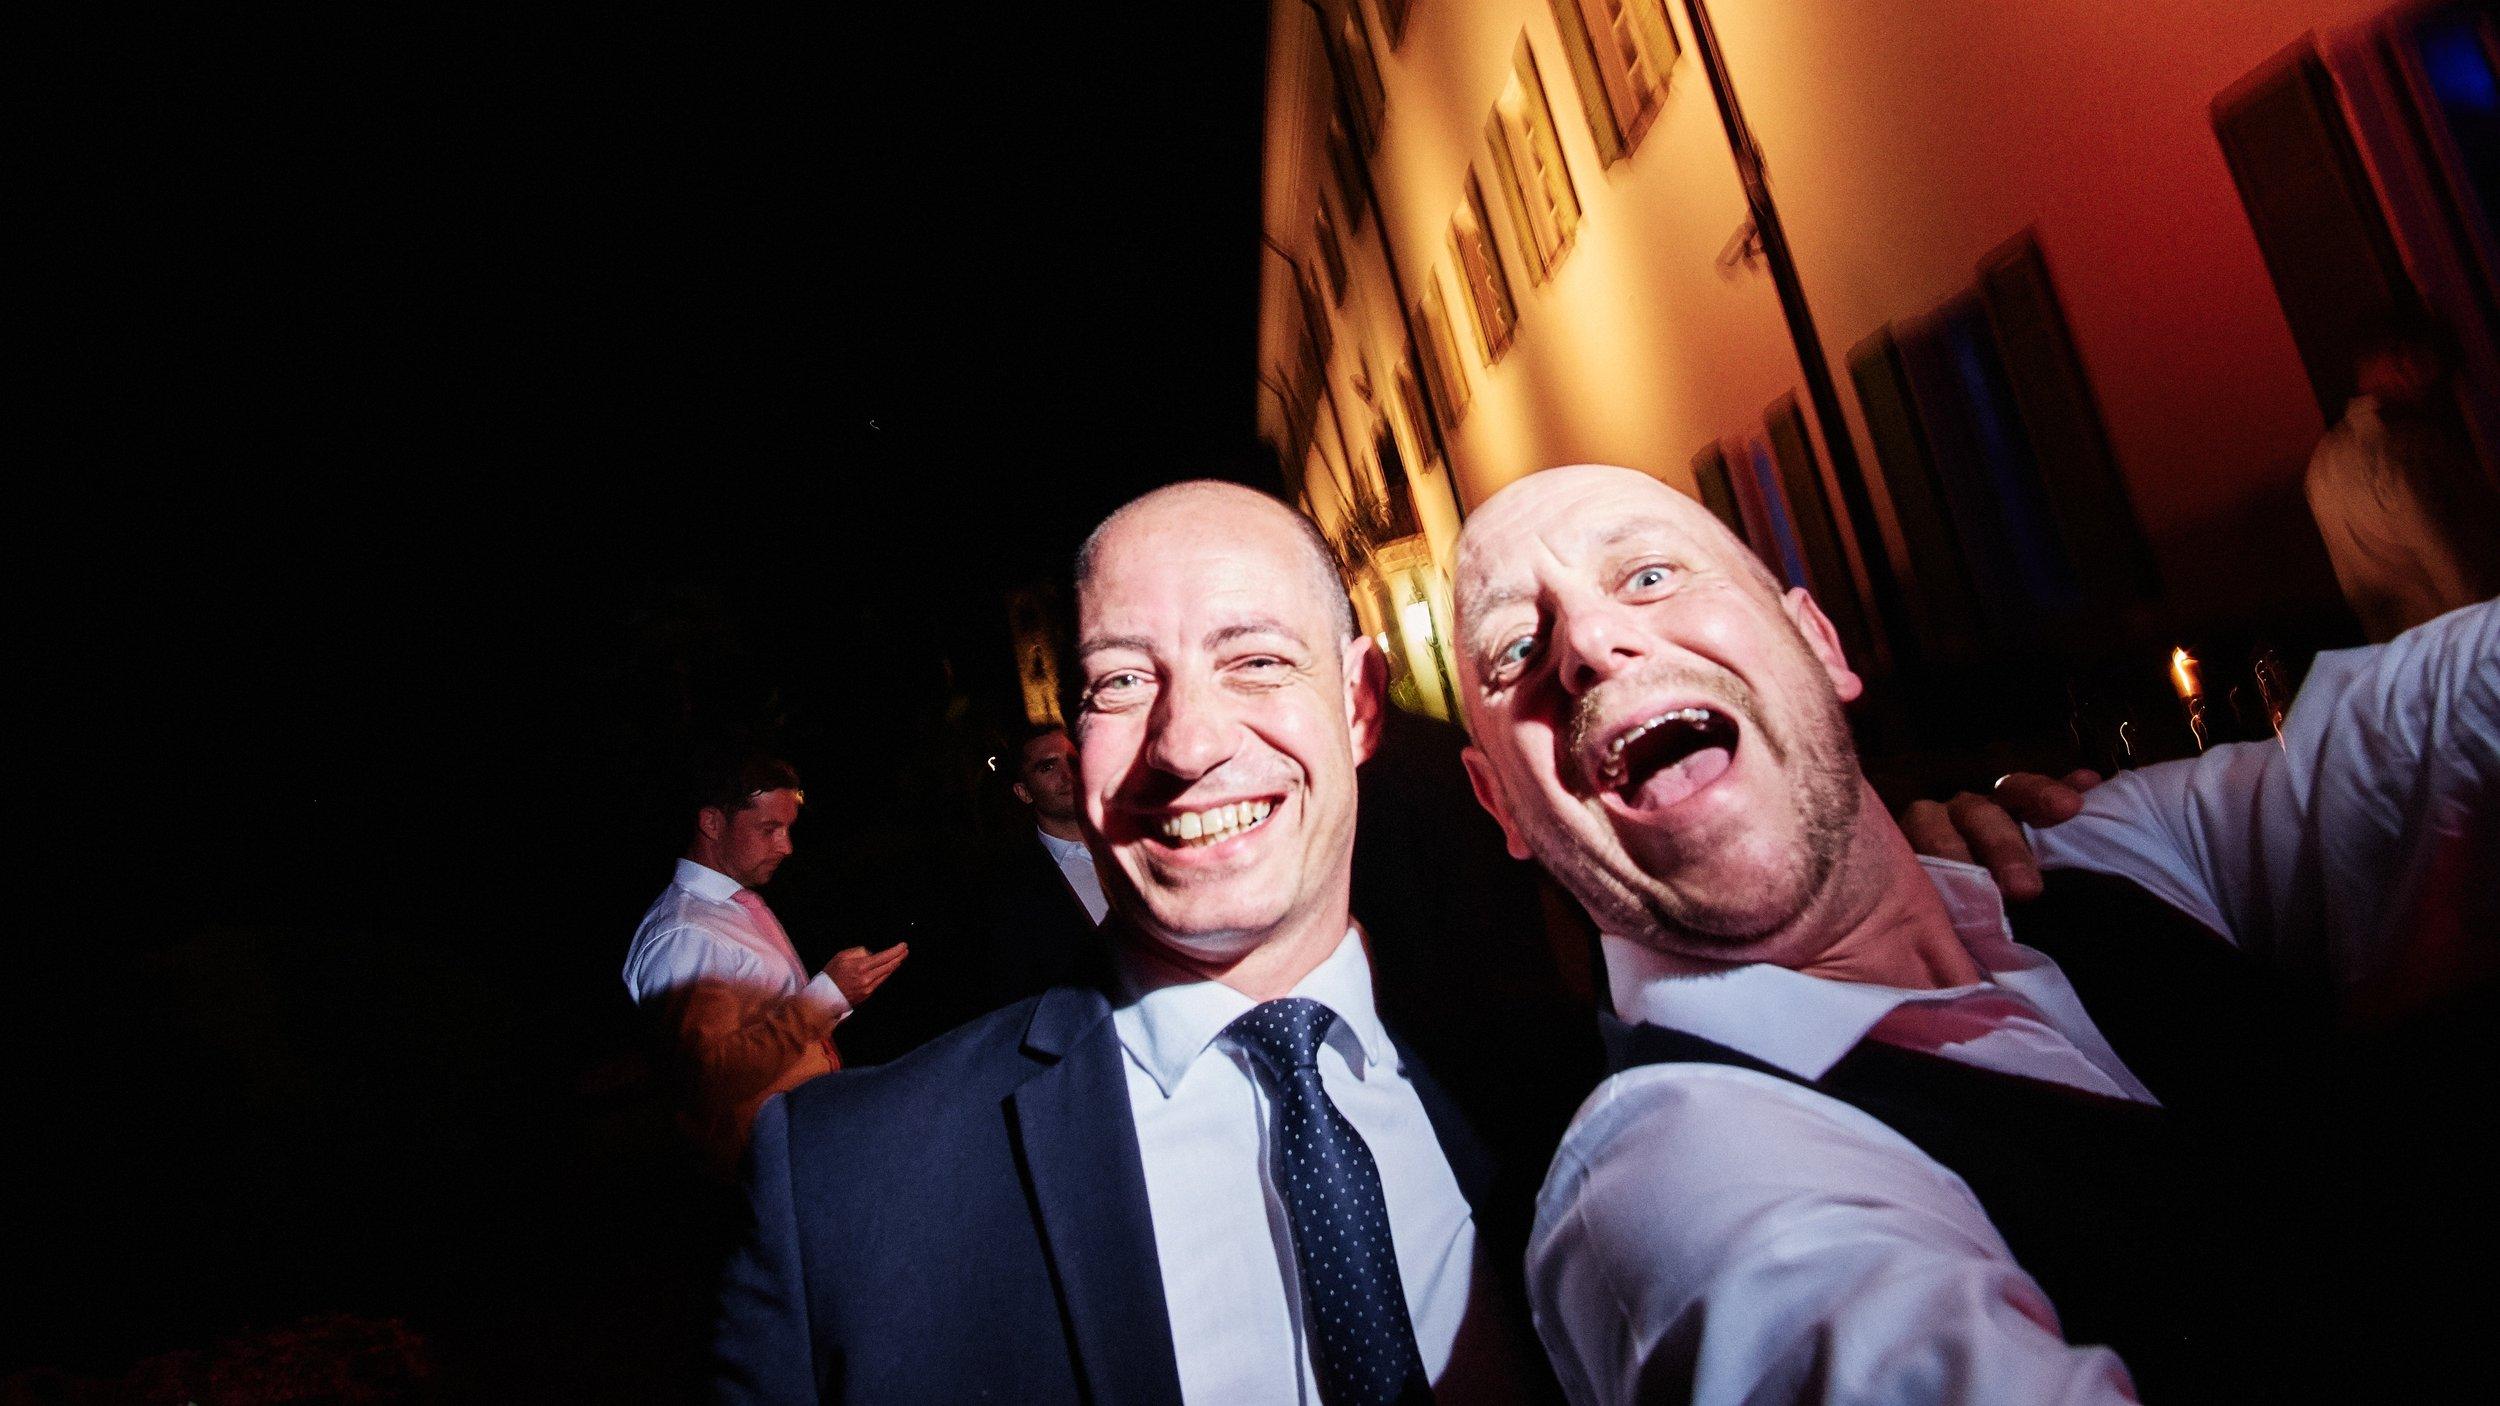 Yeah that's me. Cheeky selfie with villa owner, destination wedding